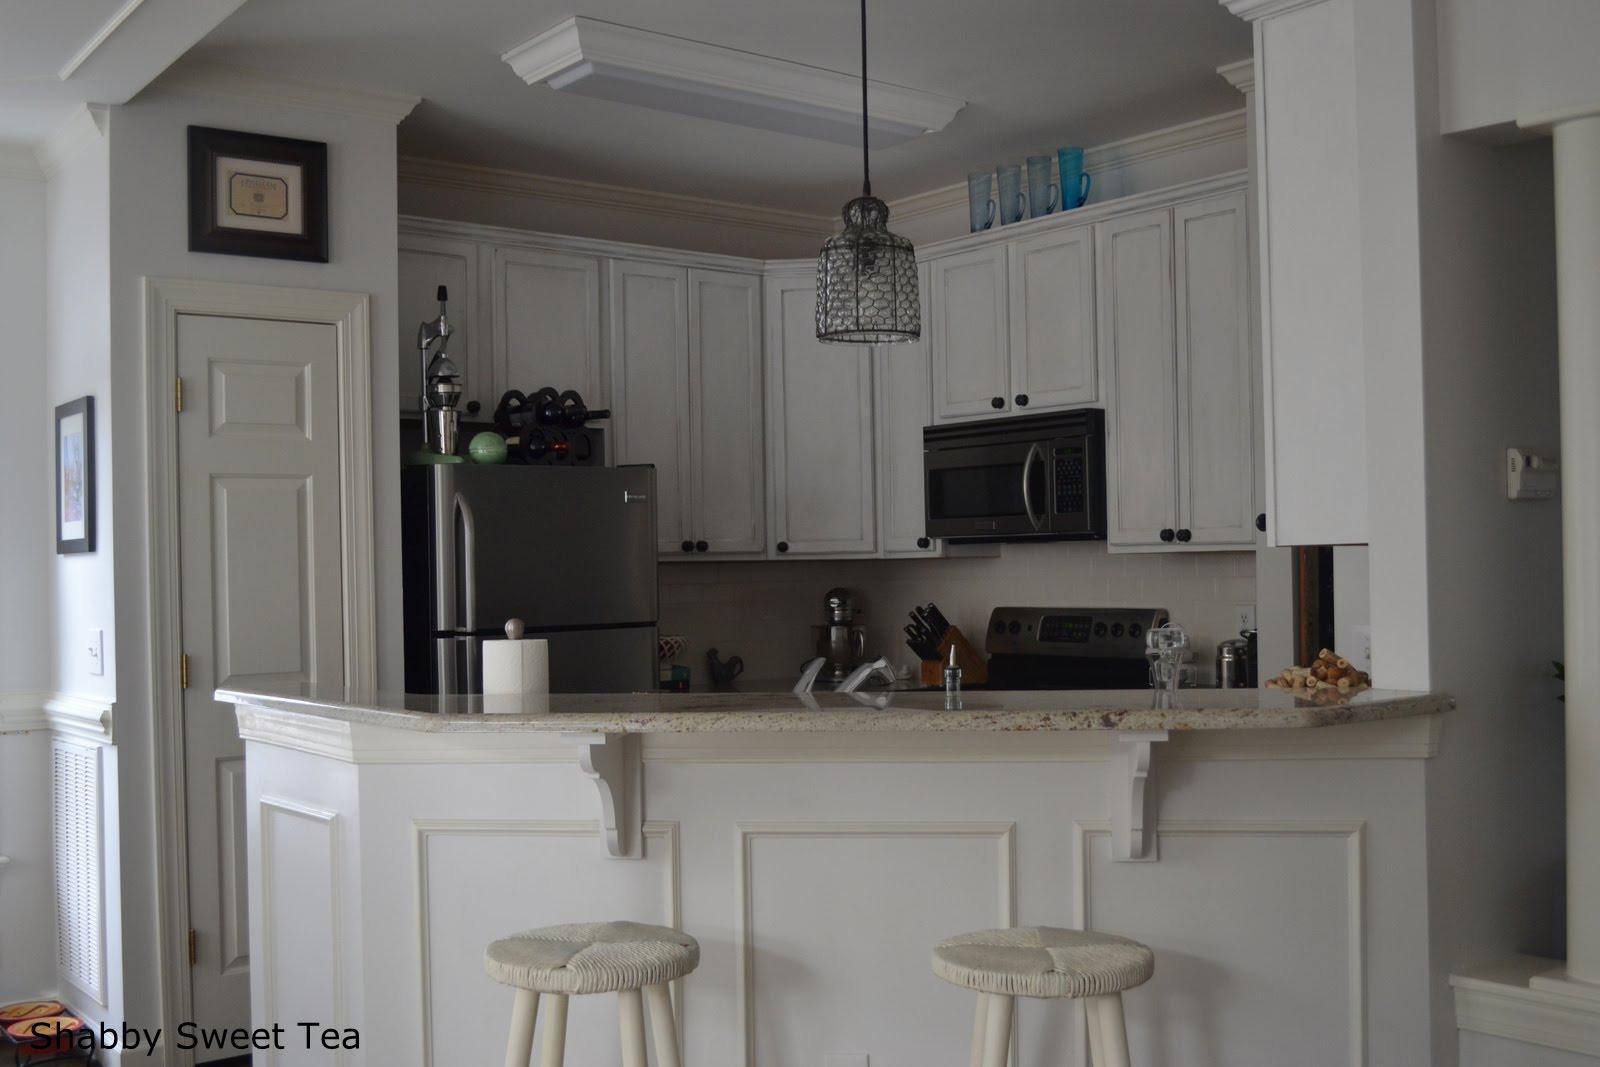 kitchen cabinets chalk paint swing kitchen rh swingkitchen blogspot com